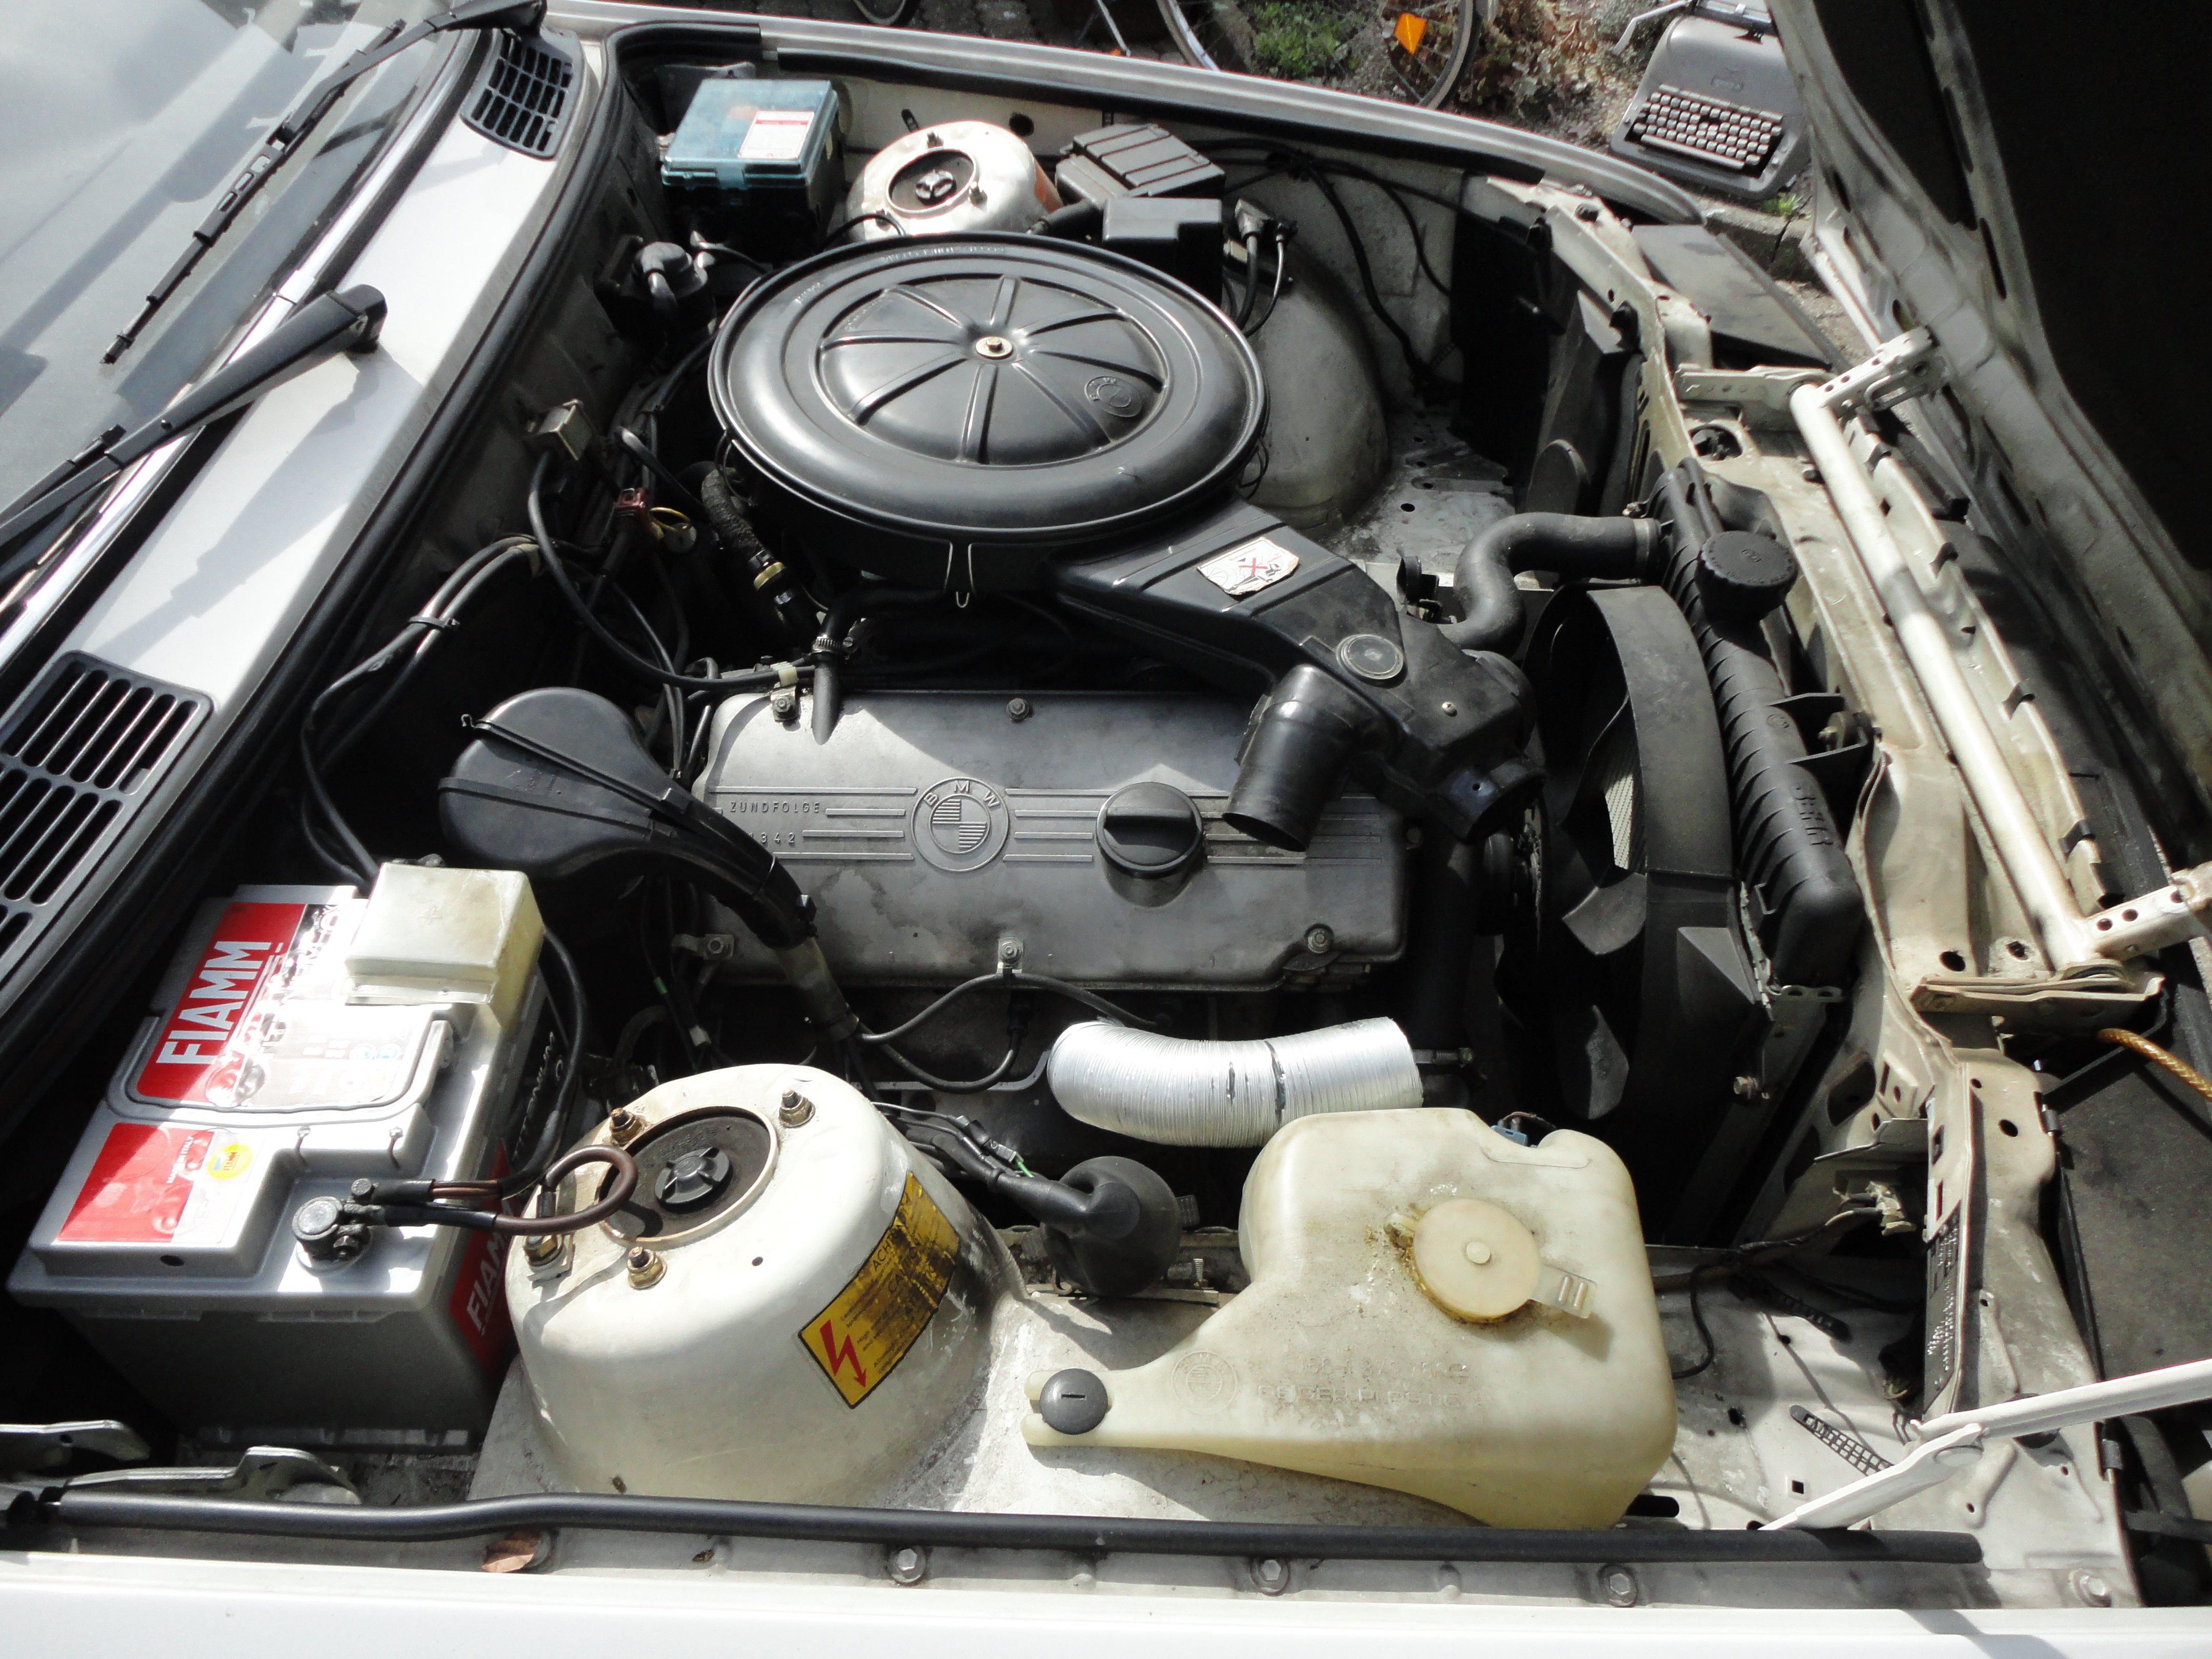 Двигатель Bmw M10 описание характеристики фото